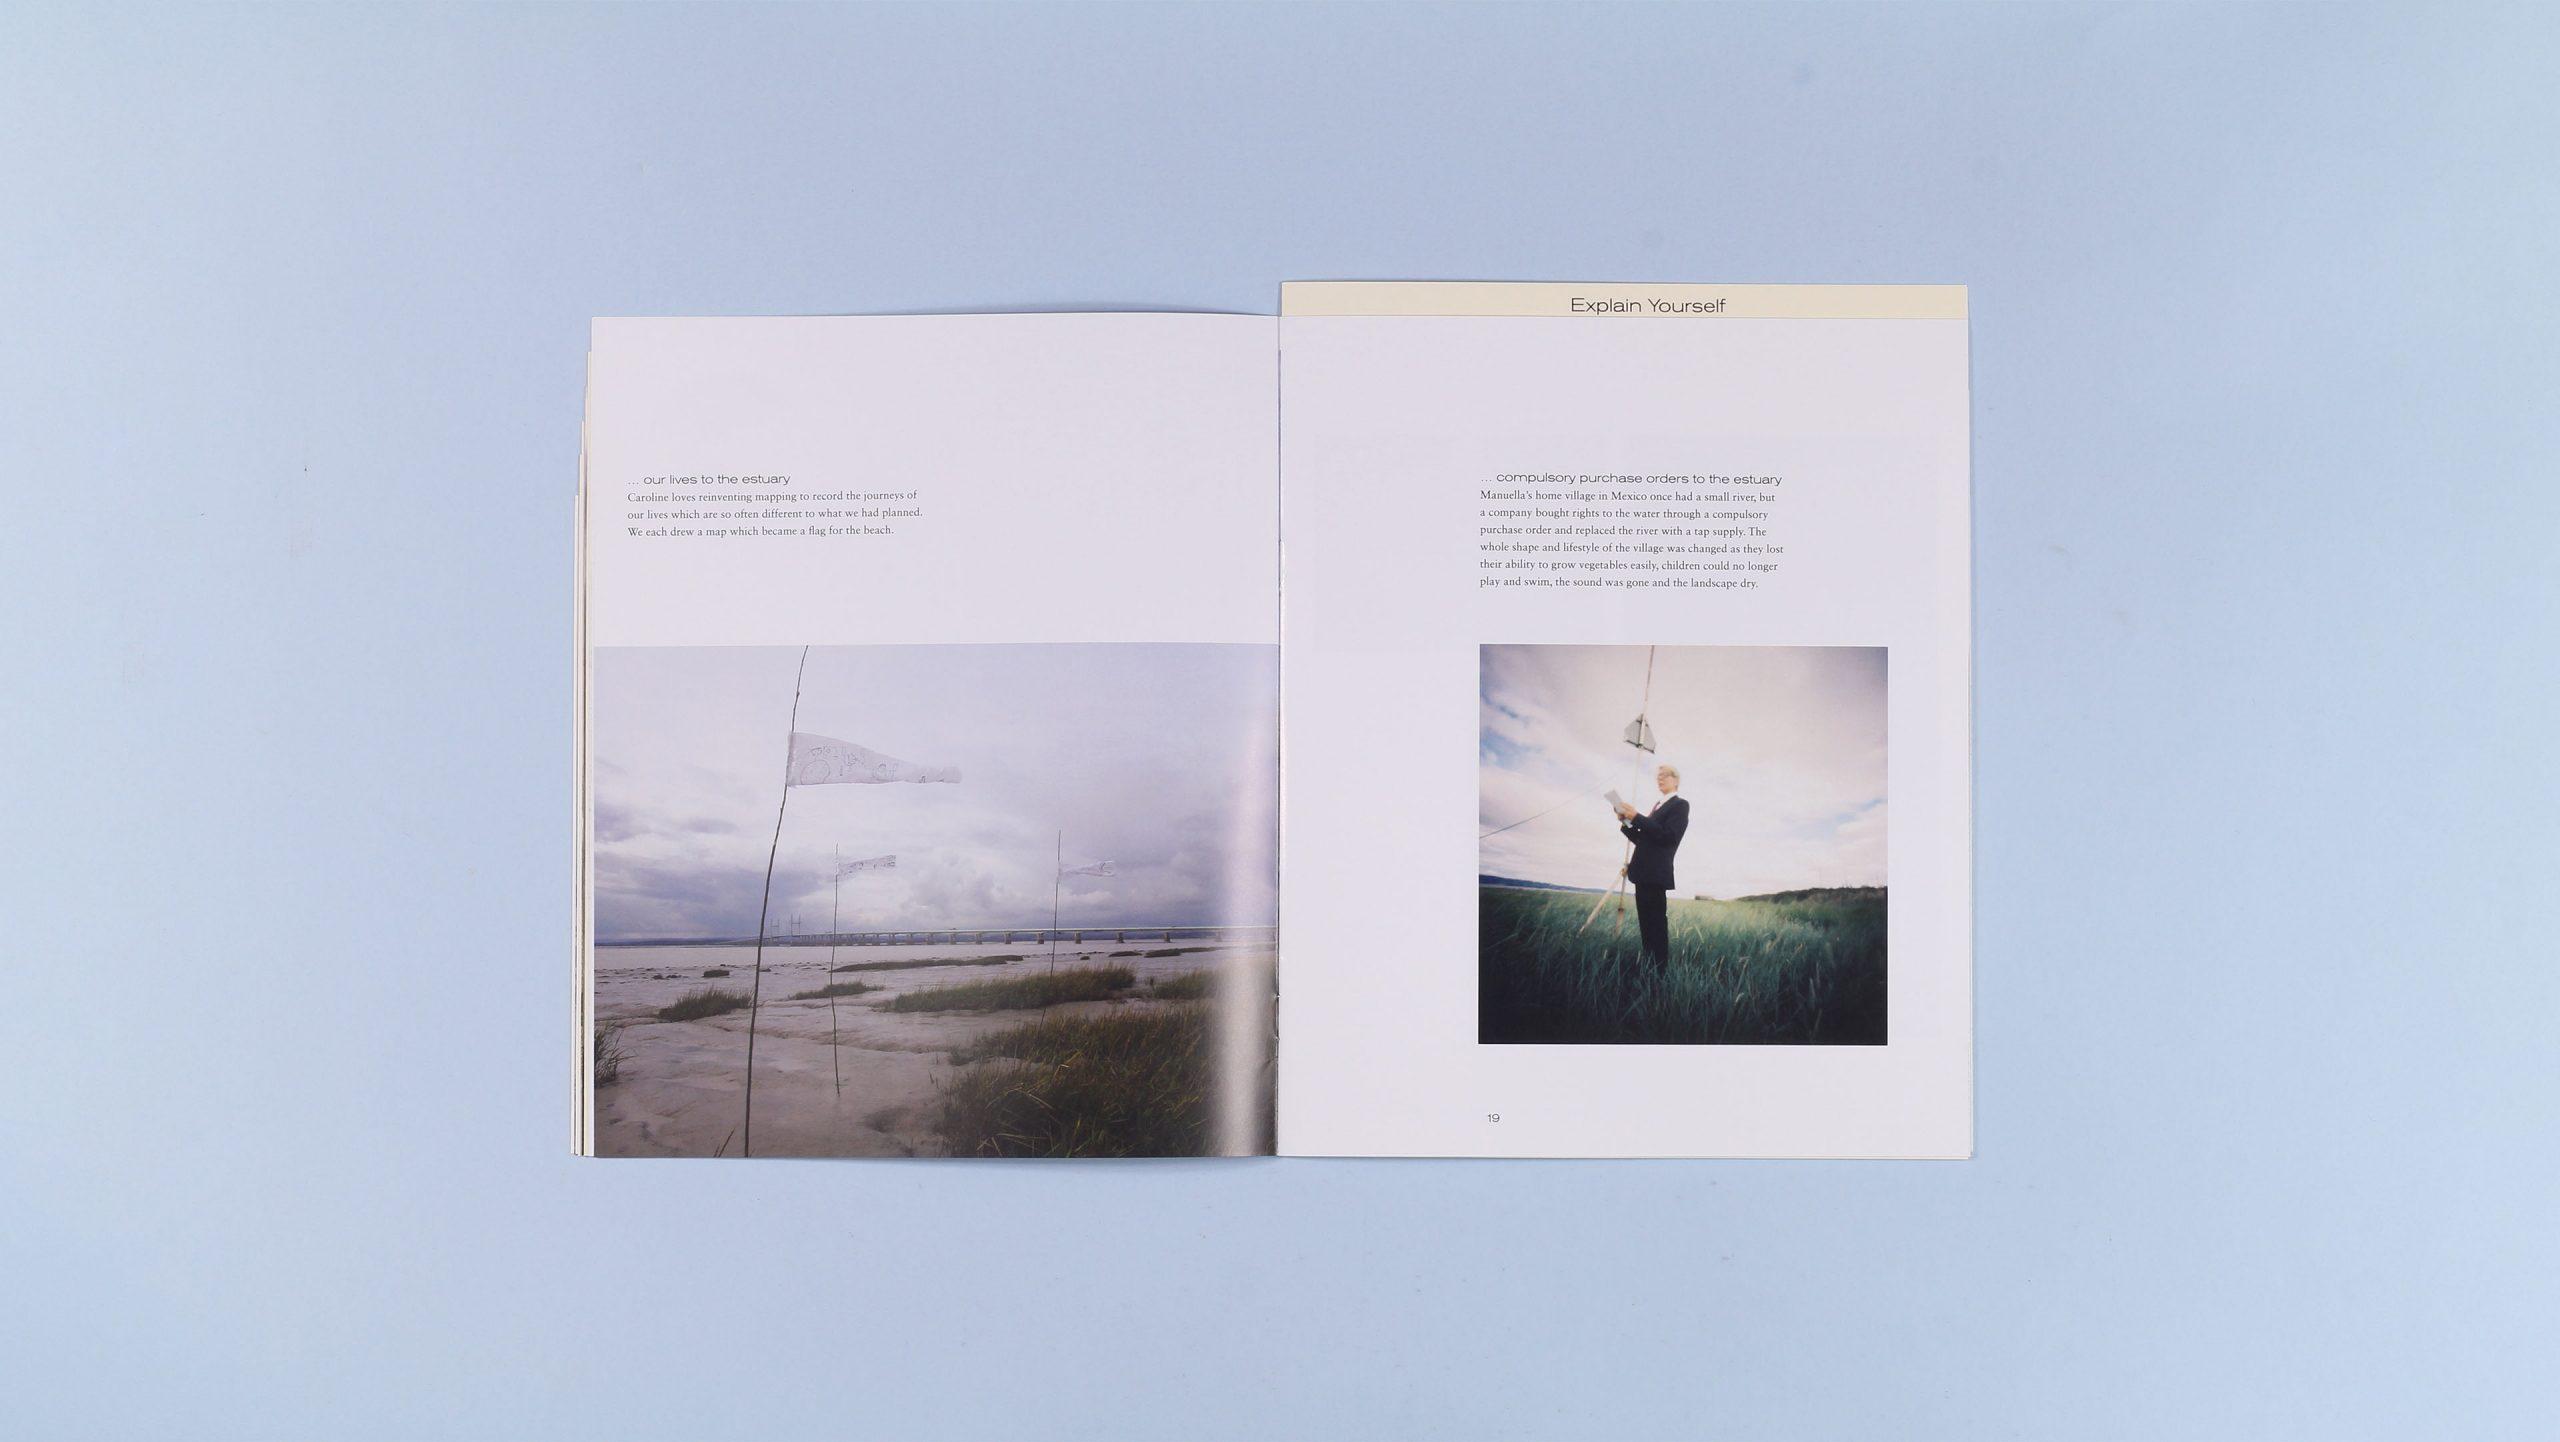 Explain Yourself publication inside spread. Publication designed by City Edition Studio.